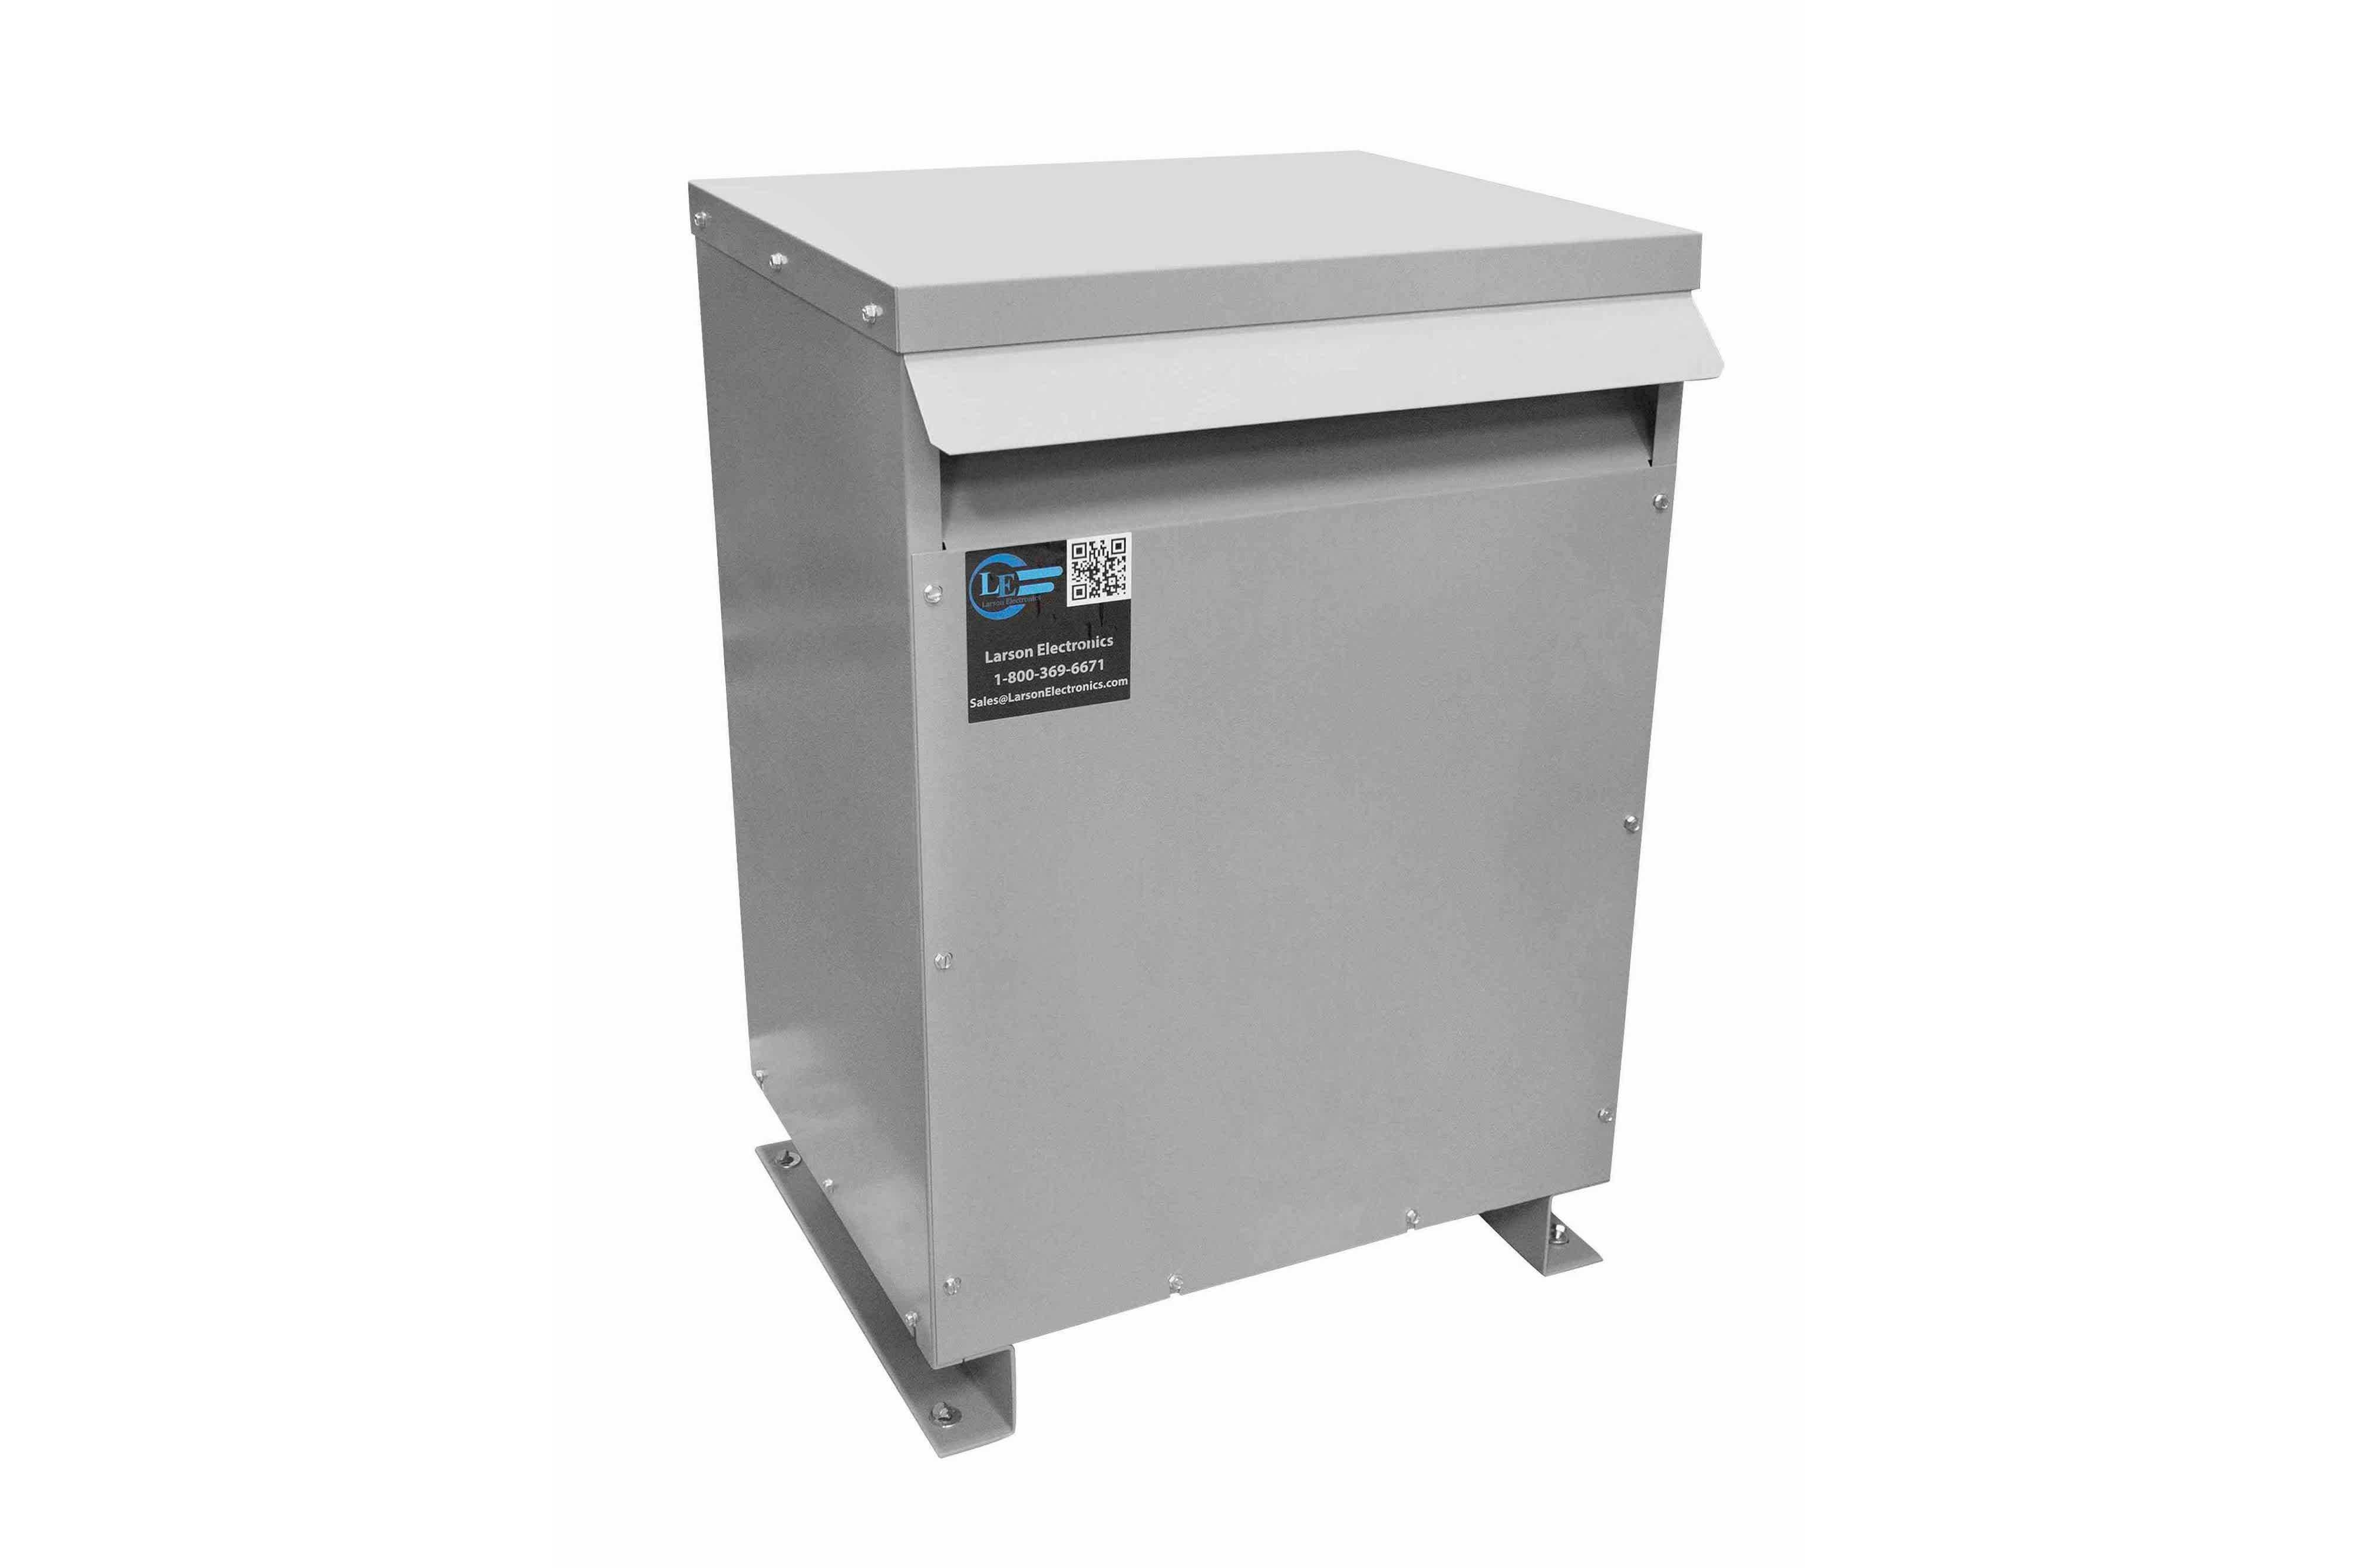 50 kVA 3PH DOE Transformer, 240V Delta Primary, 480Y/277 Wye-N Secondary, N3R, Ventilated, 60 Hz